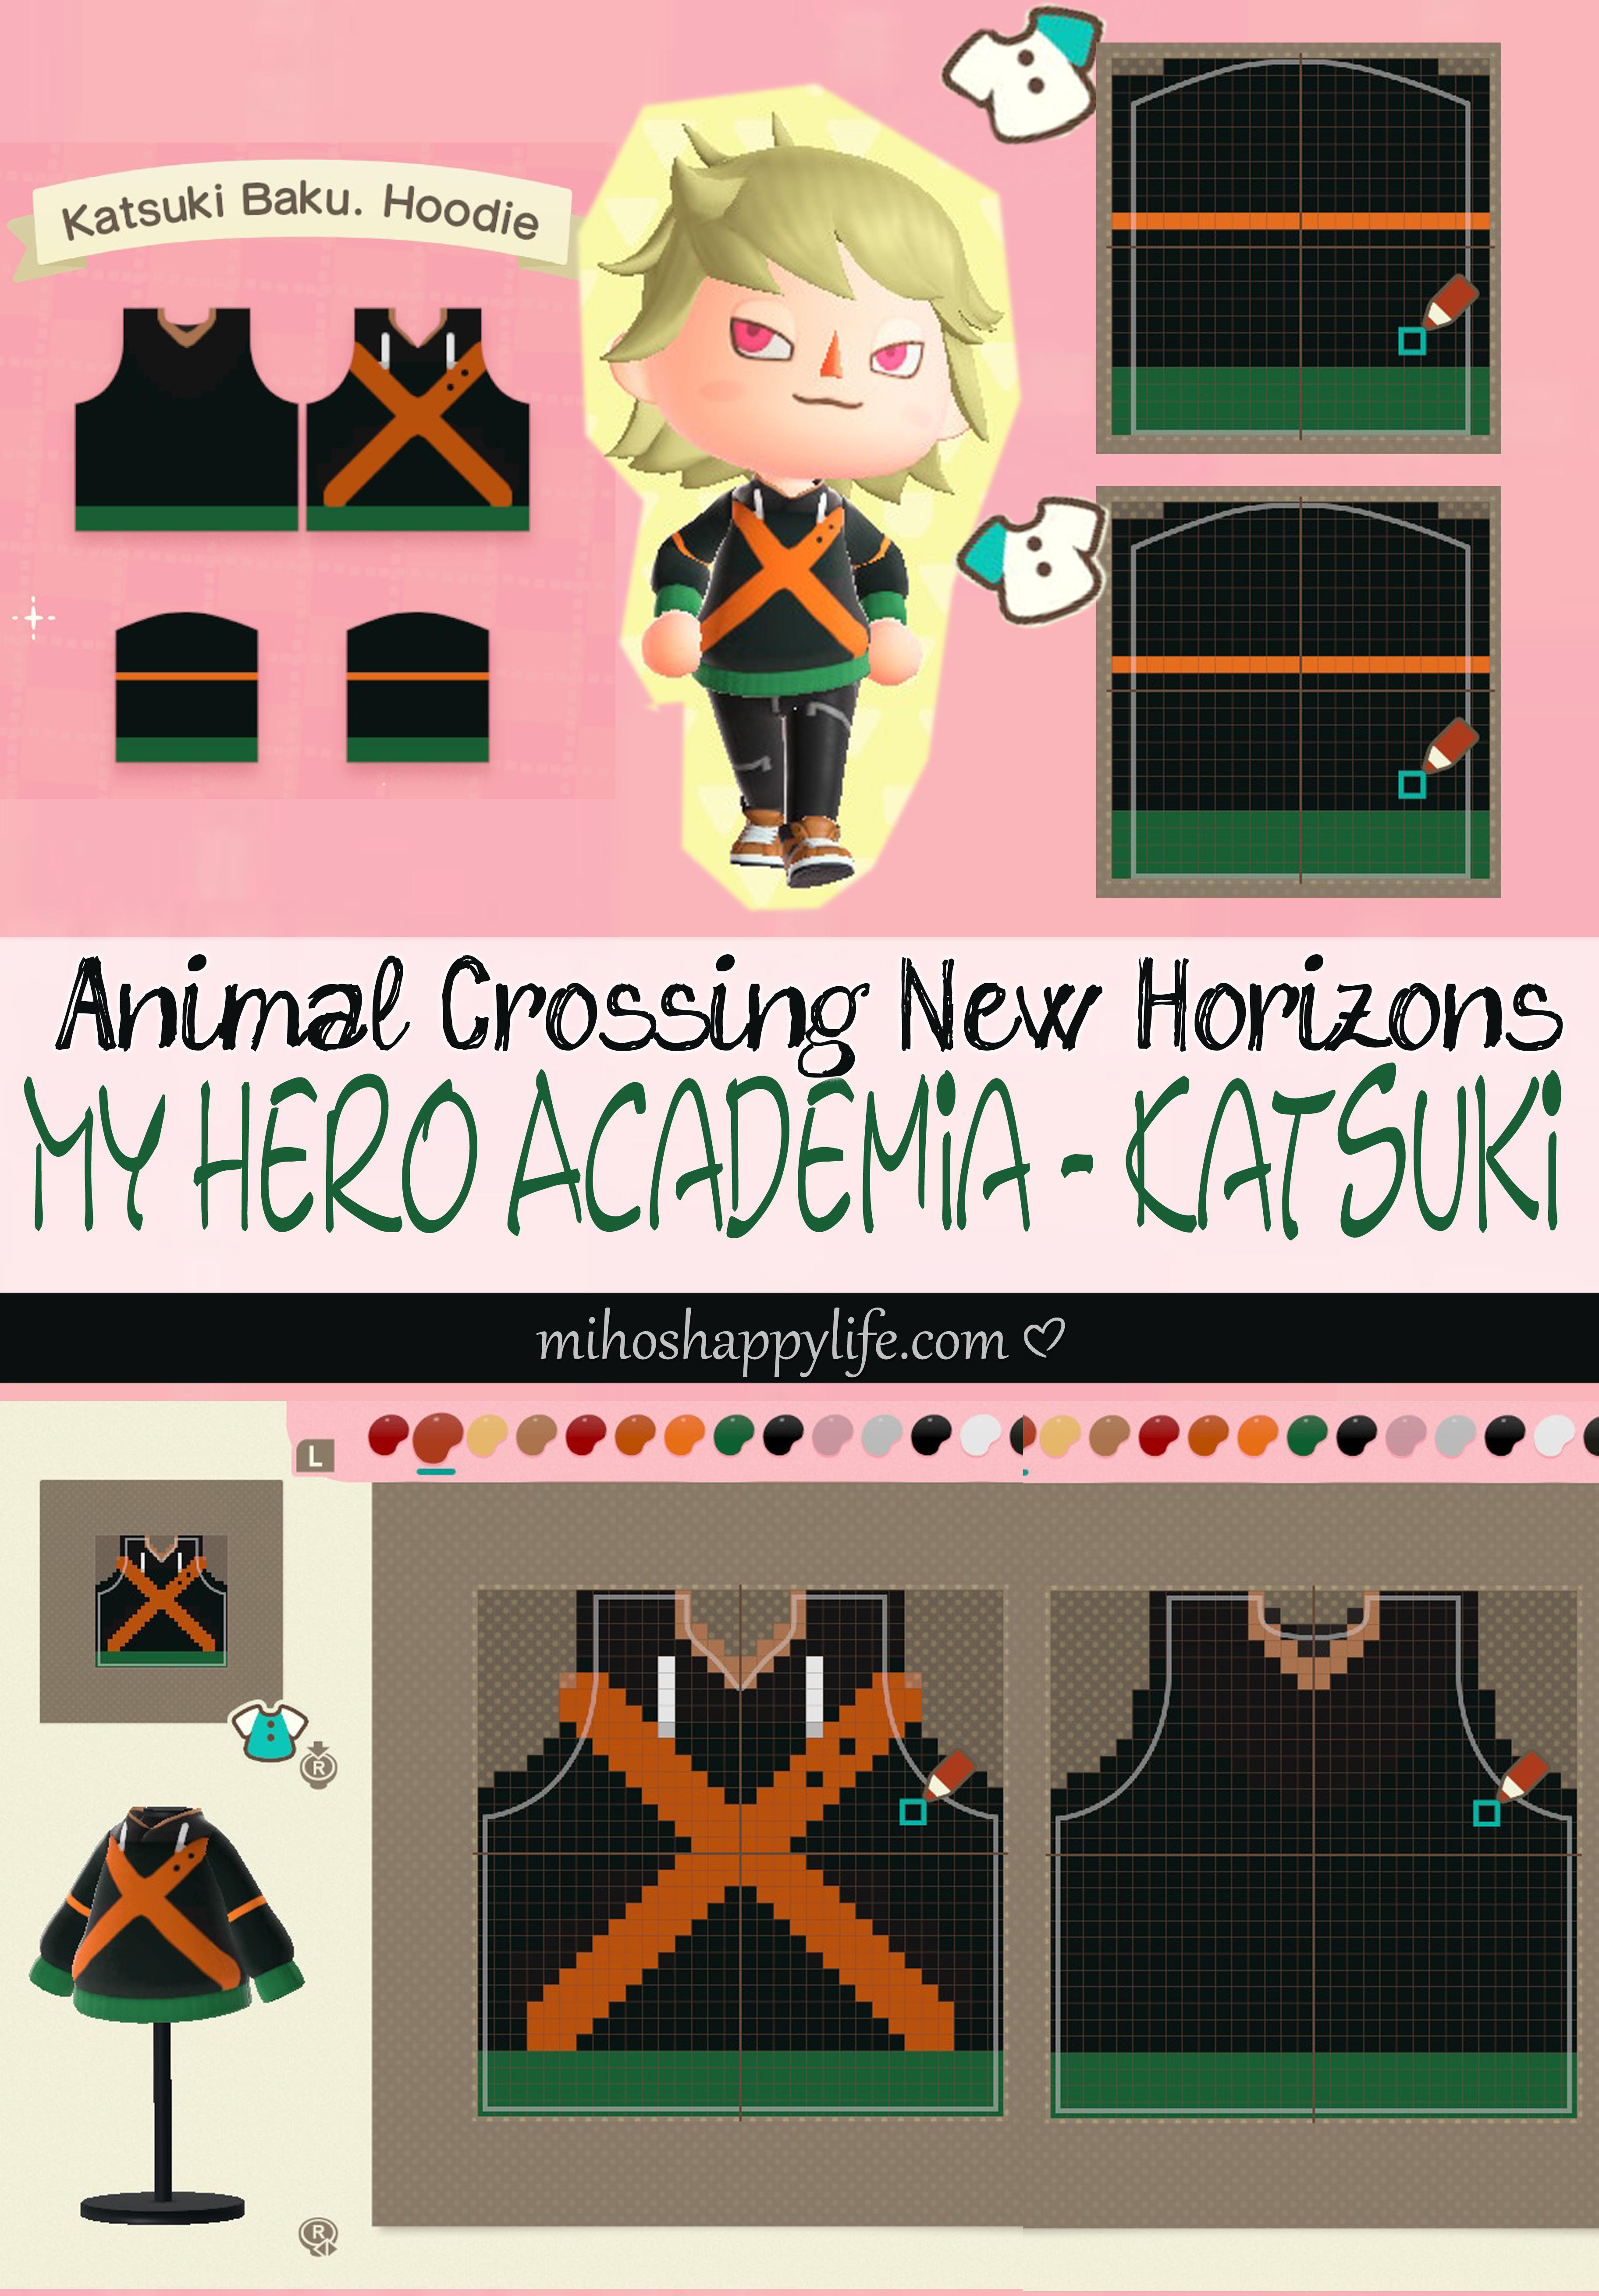 mihoshappylife-animal-crossing-my-hero-academia-katsuki